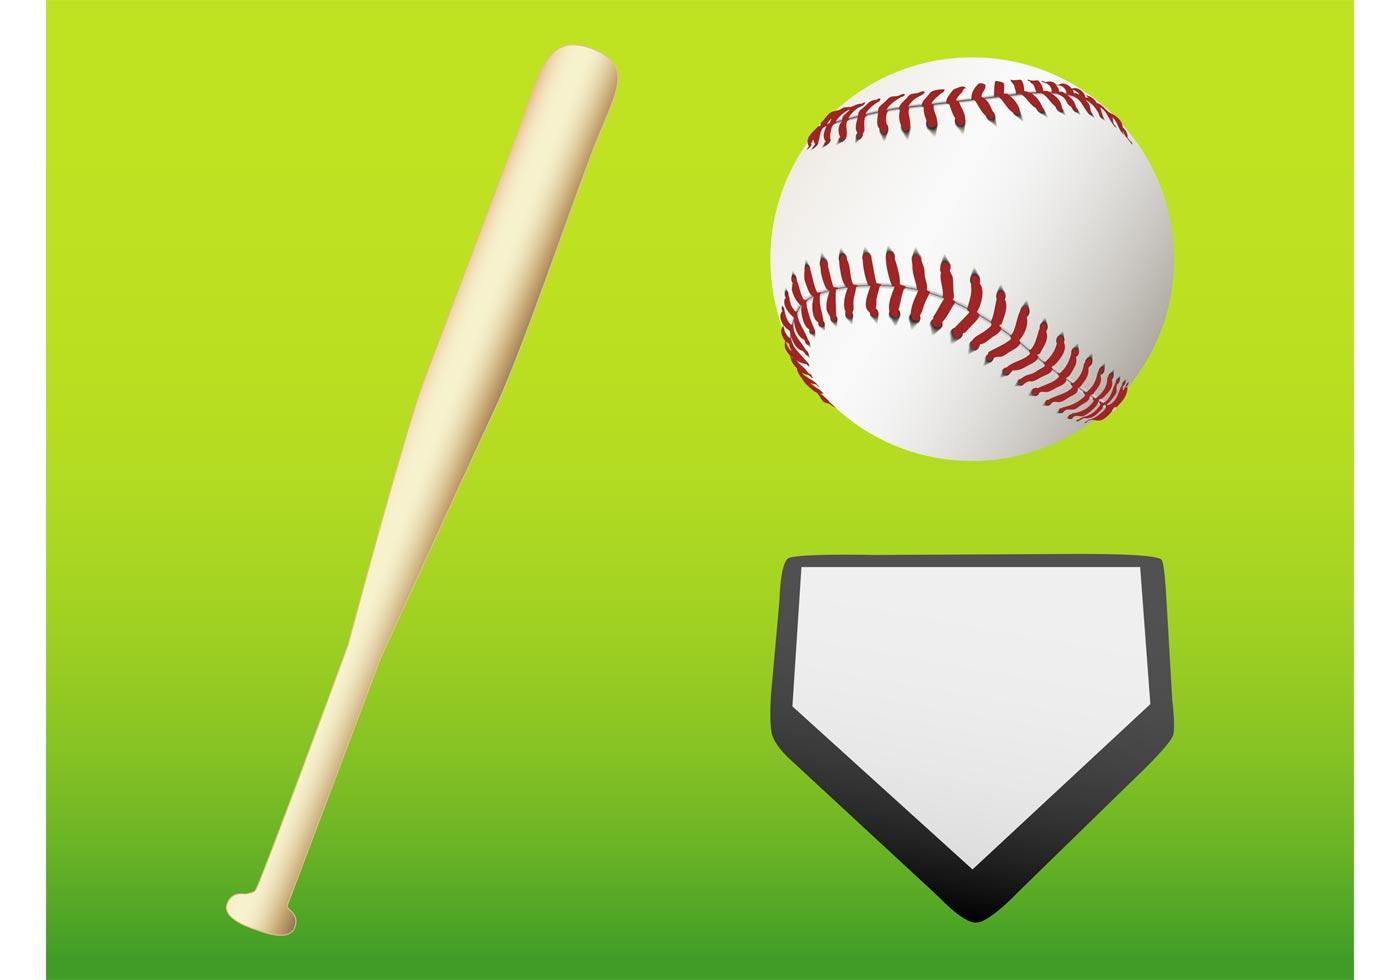 baseball gear download free vector art  stock graphics Extreme Baseball Logo Designs Extreme Baseball Logo Designs